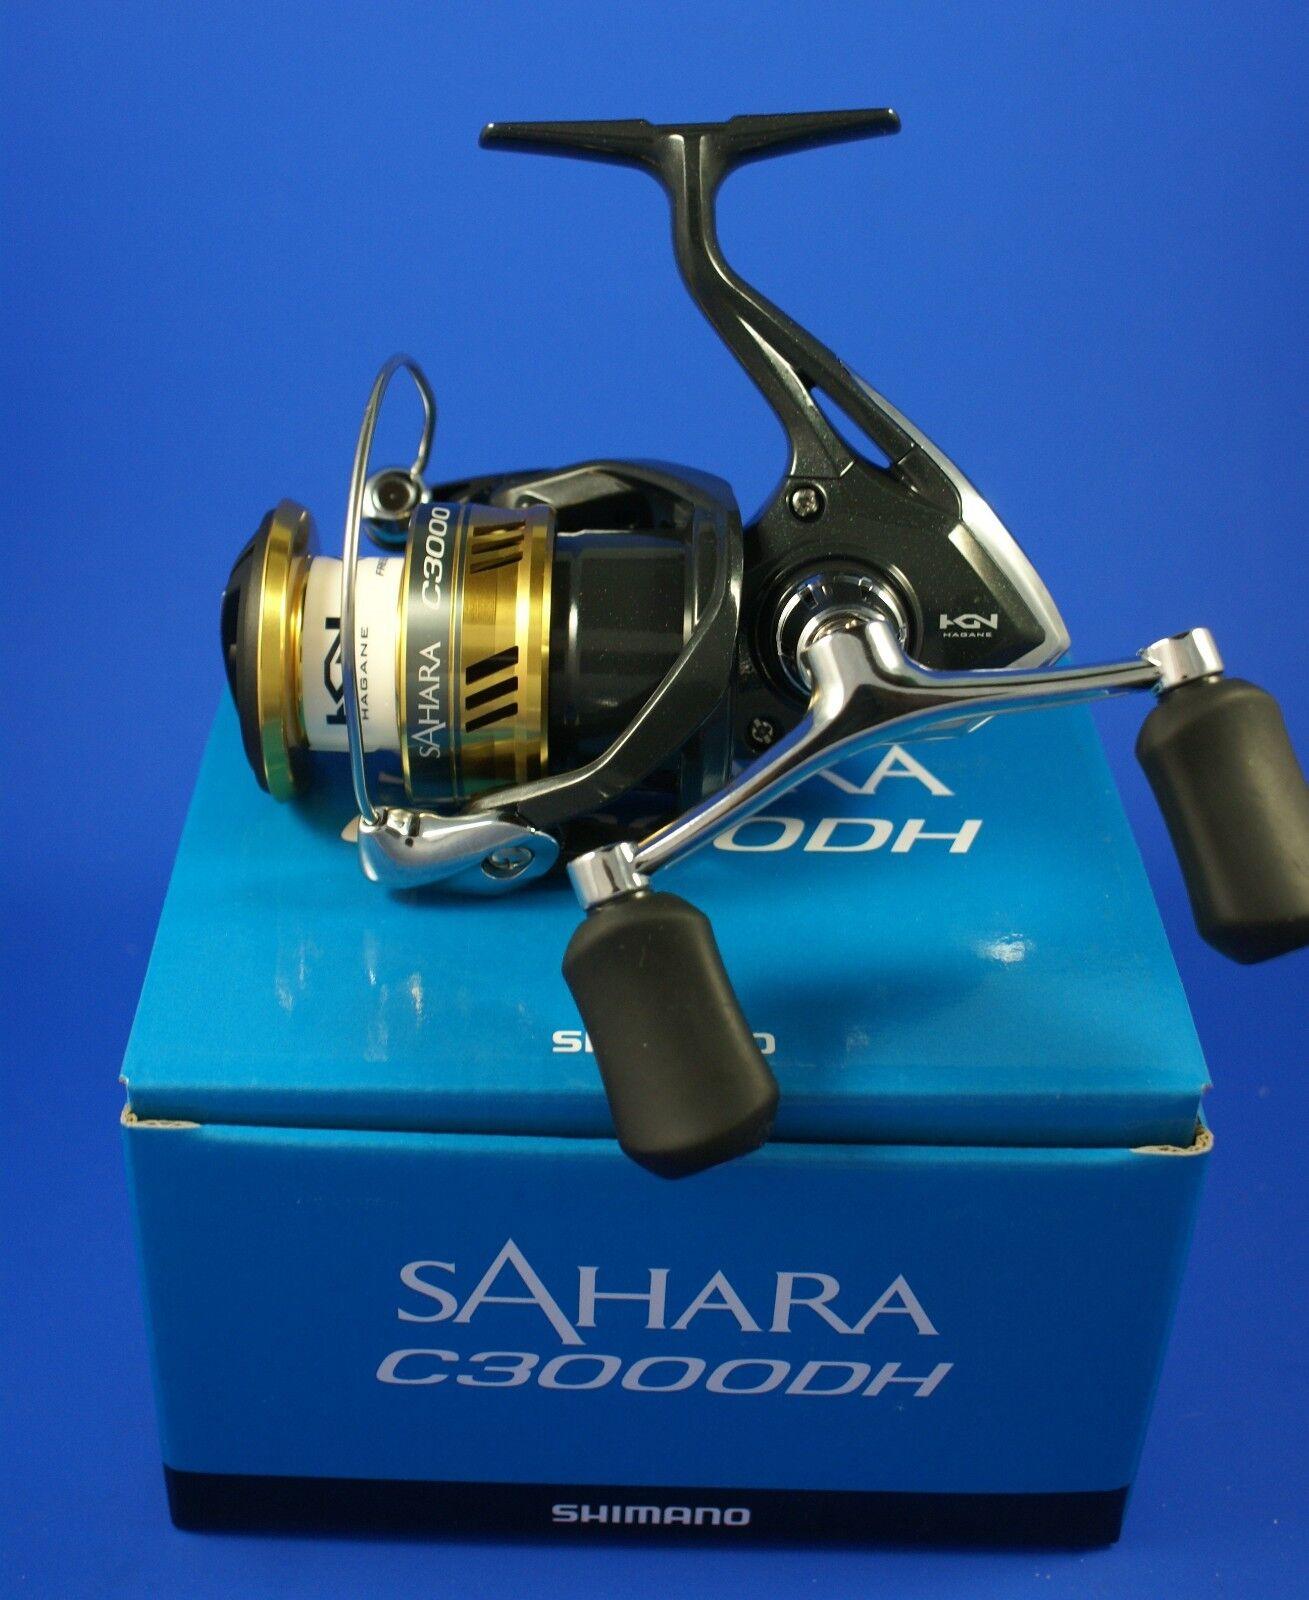 Shimano SAHARA C3000DH FI  SHC 3000 dhfi  mulinello da pesca trascinamento frontale